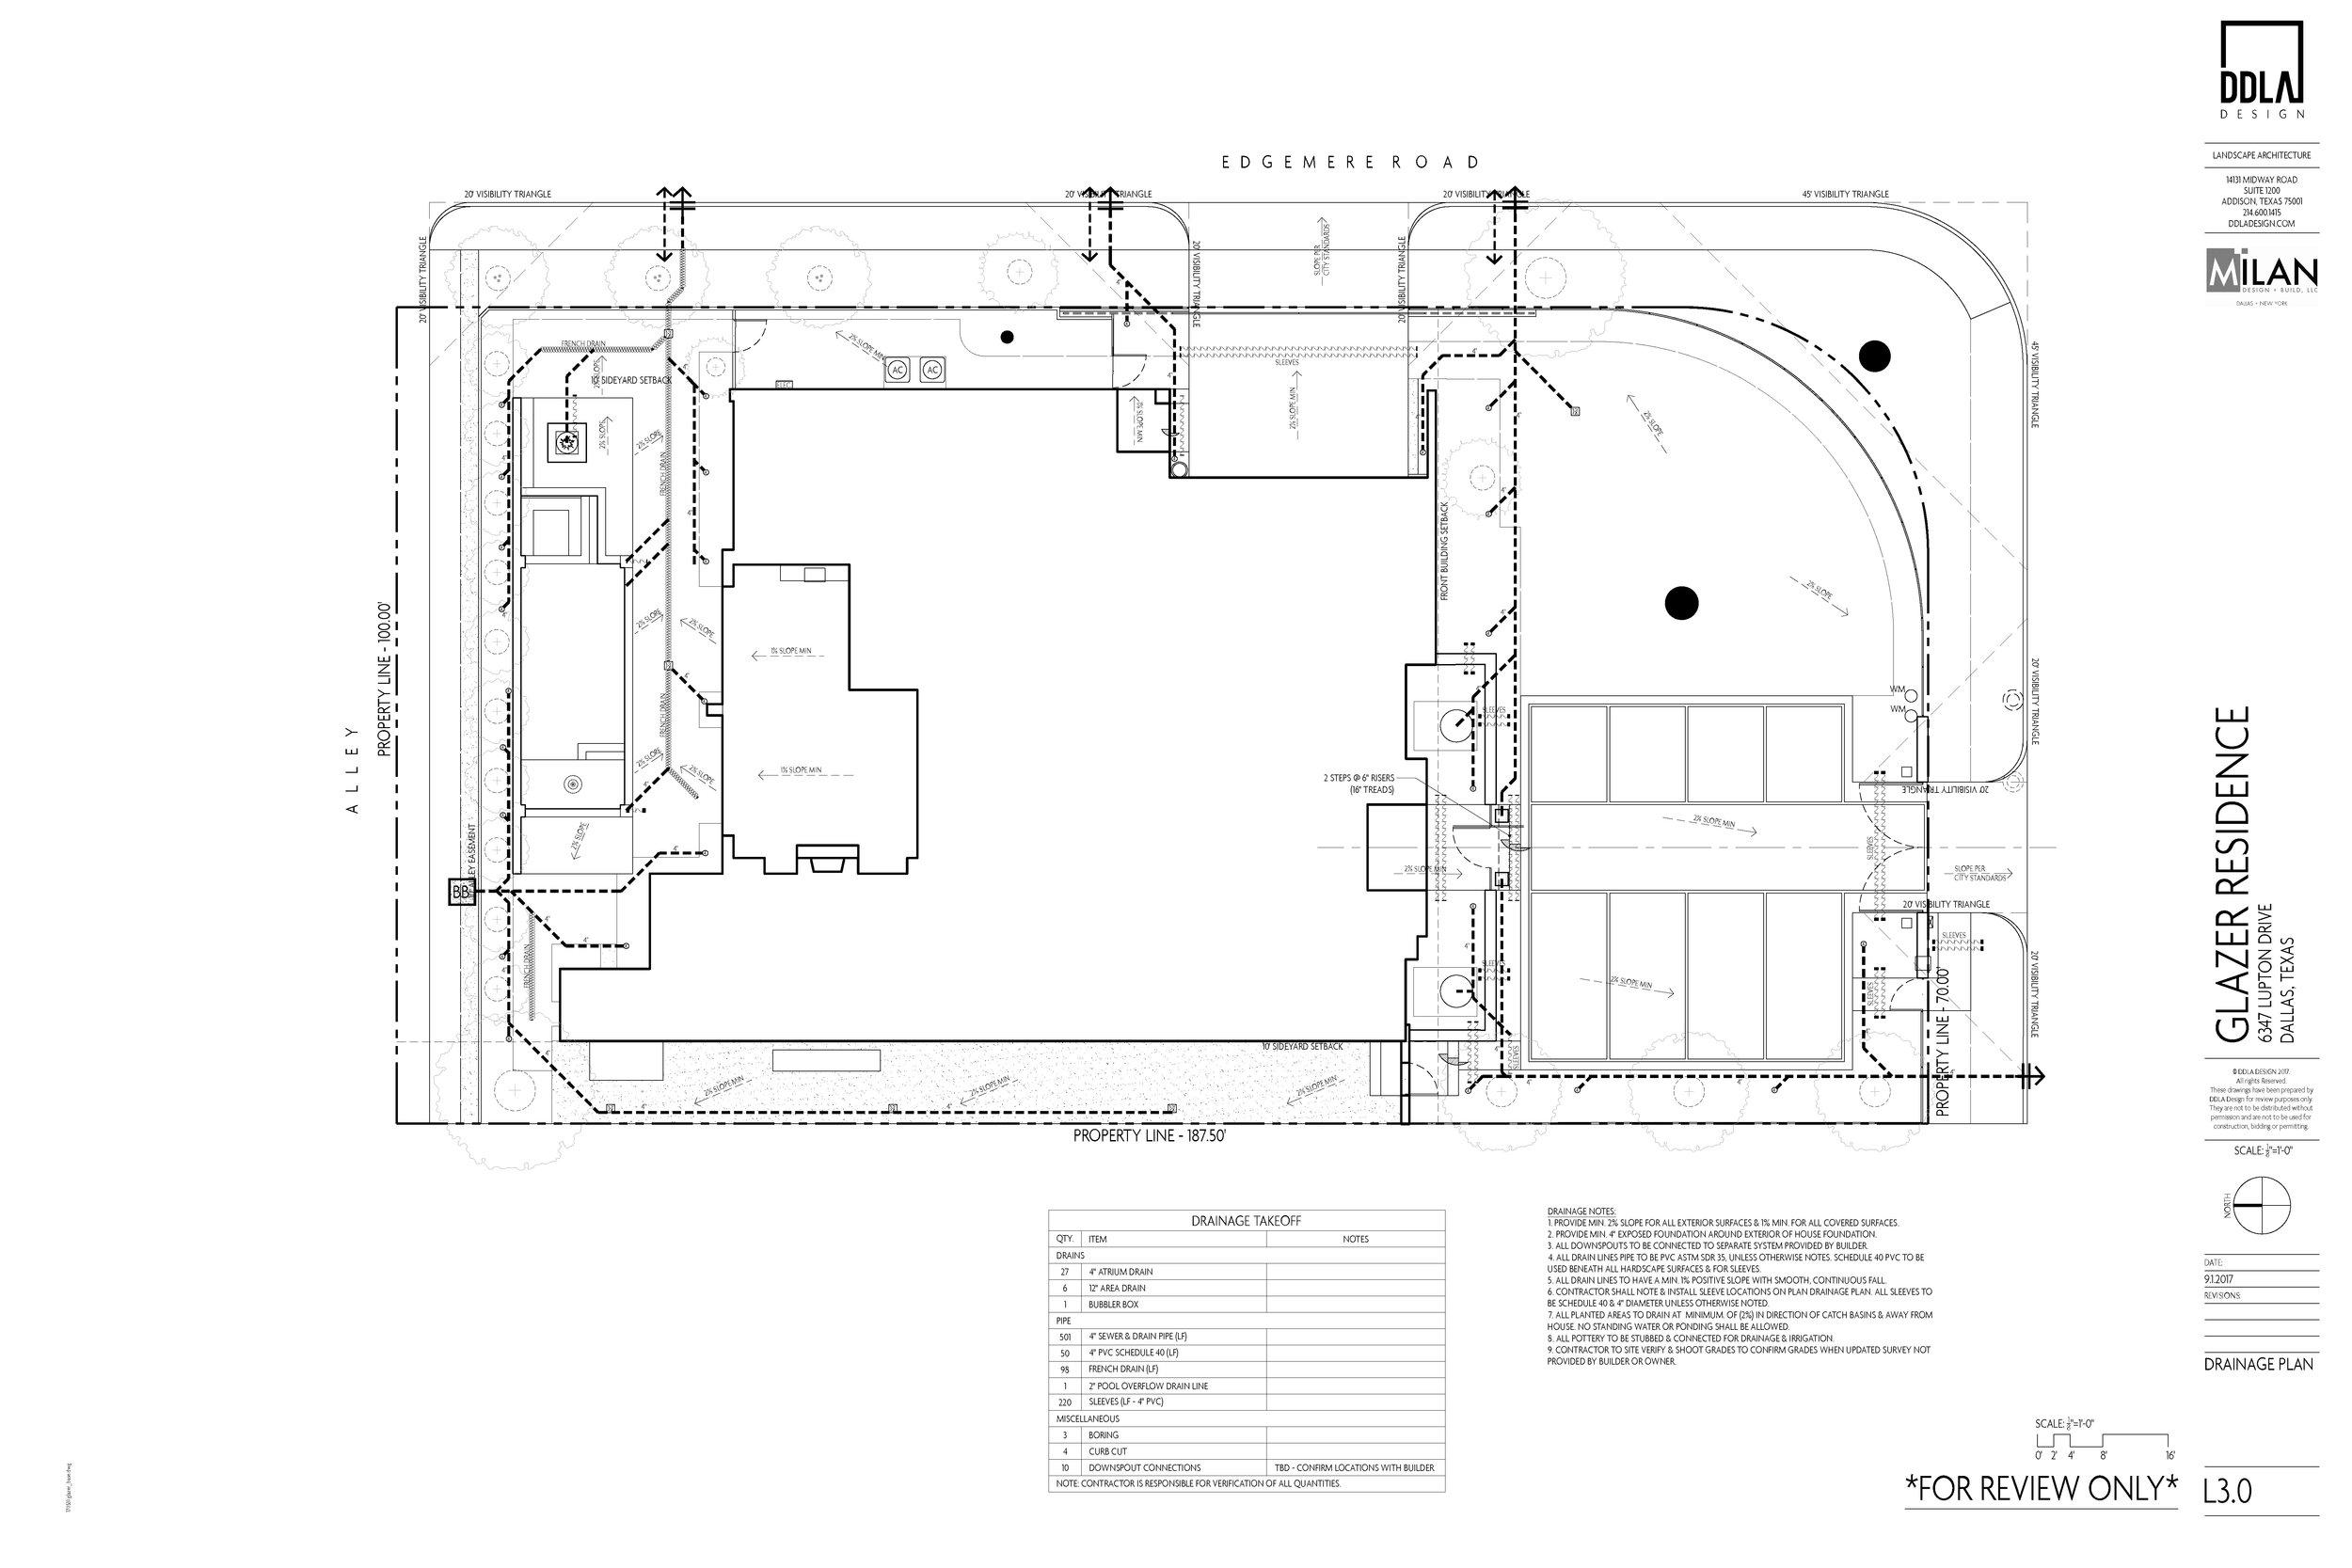 170901 glazer_cd drawing set_Page_4.jpg